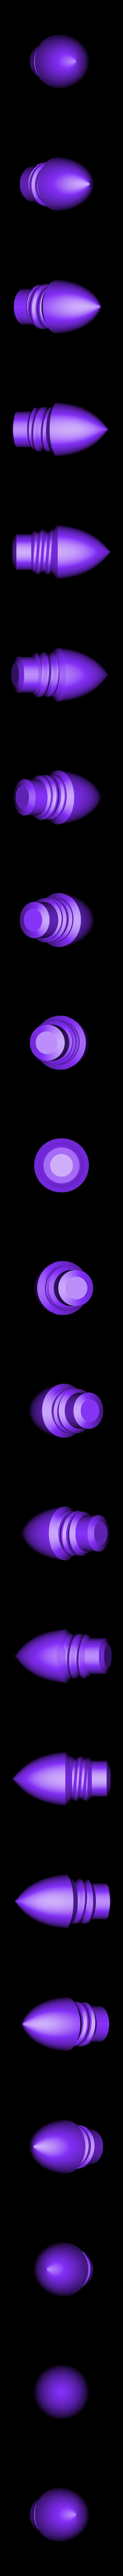 SirHa_Schraube3.stl Télécharger fichier STL gratuit Air Raid Siren - hand crank version • Plan imprimable en 3D, MlePh